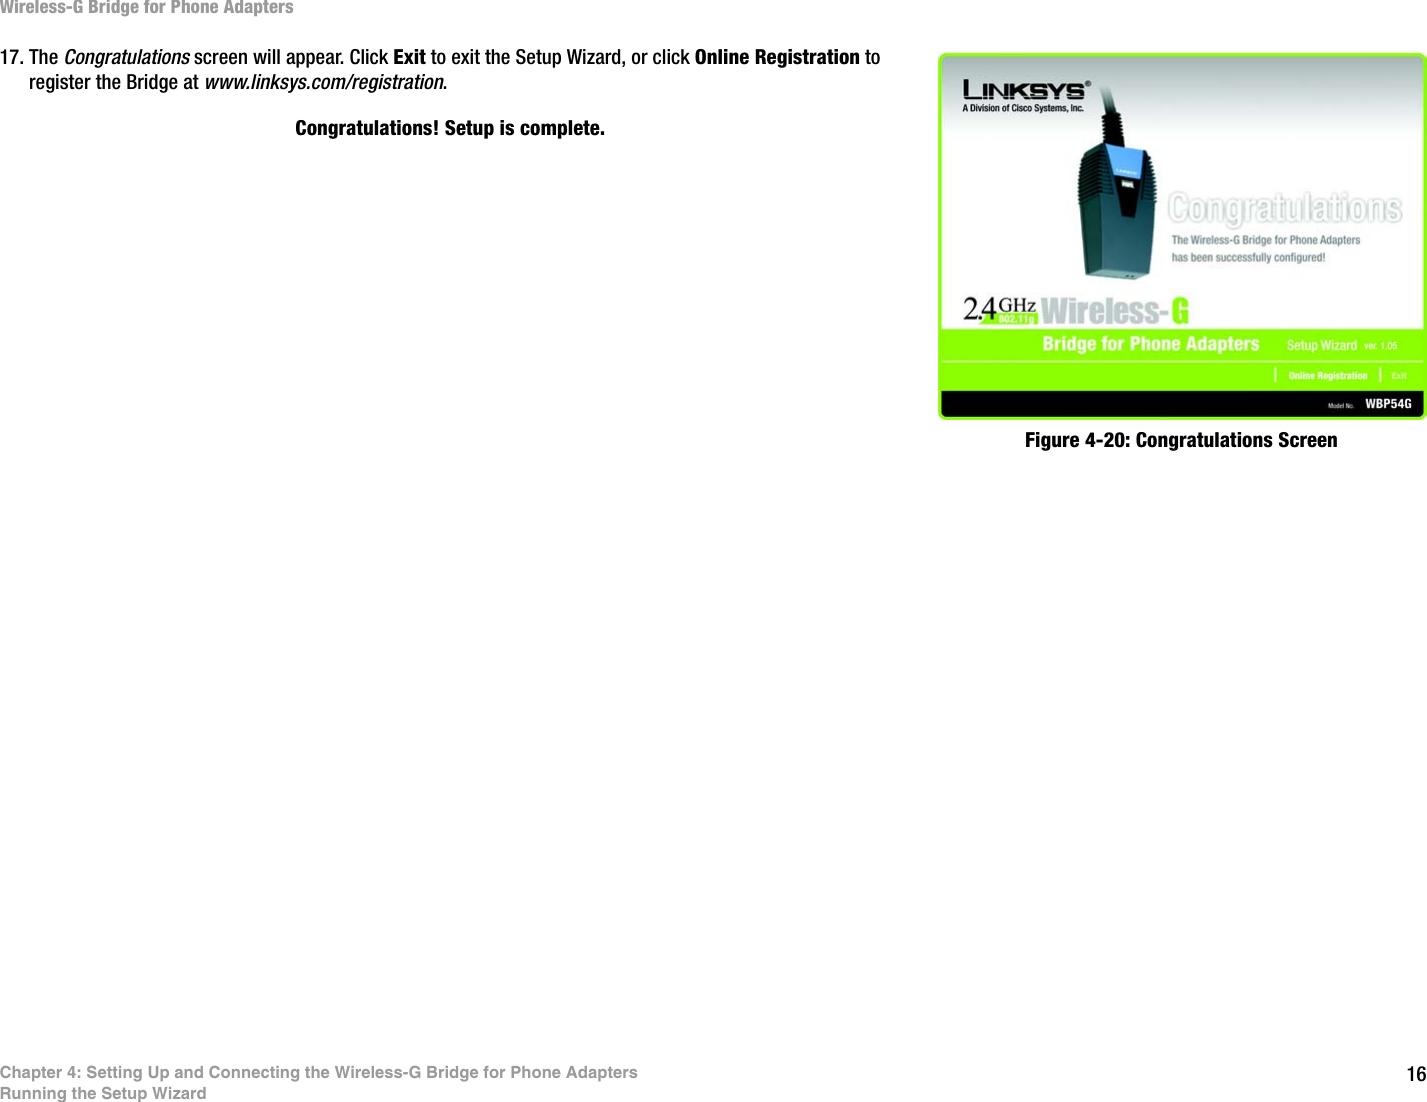 LINKSYS WBP54GV2 Wireless-G Bridge for Phone Adapters User